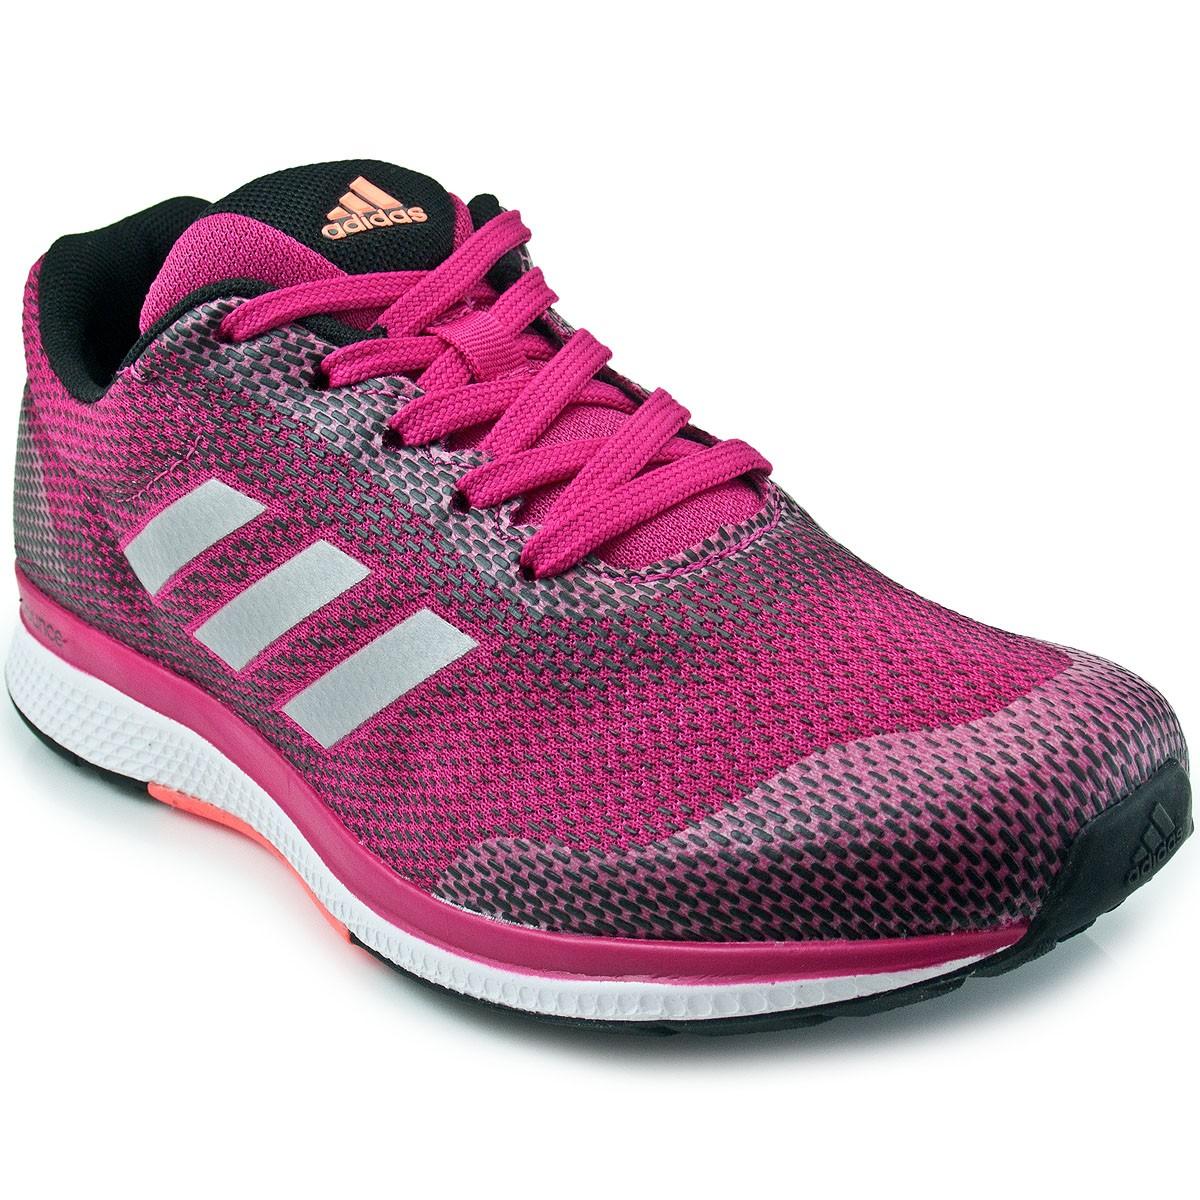 2f08eaf2f08 Tênis Adidas Mana Bounce 2.0 W